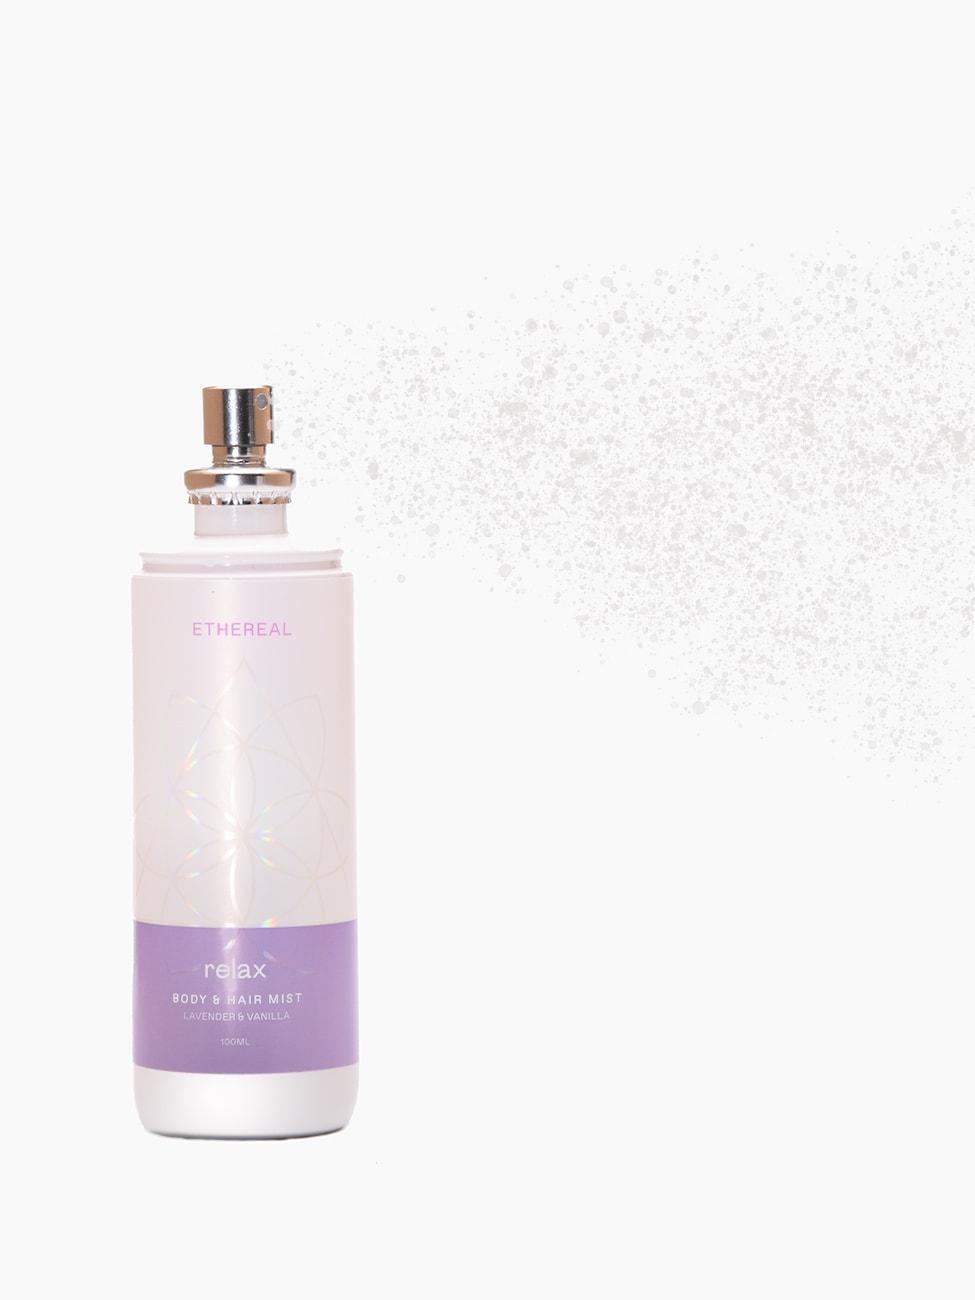 Relax_Mist_spray_Ethereal_Dermocosmetics_Skincare_Handmade_Greek_Products_1